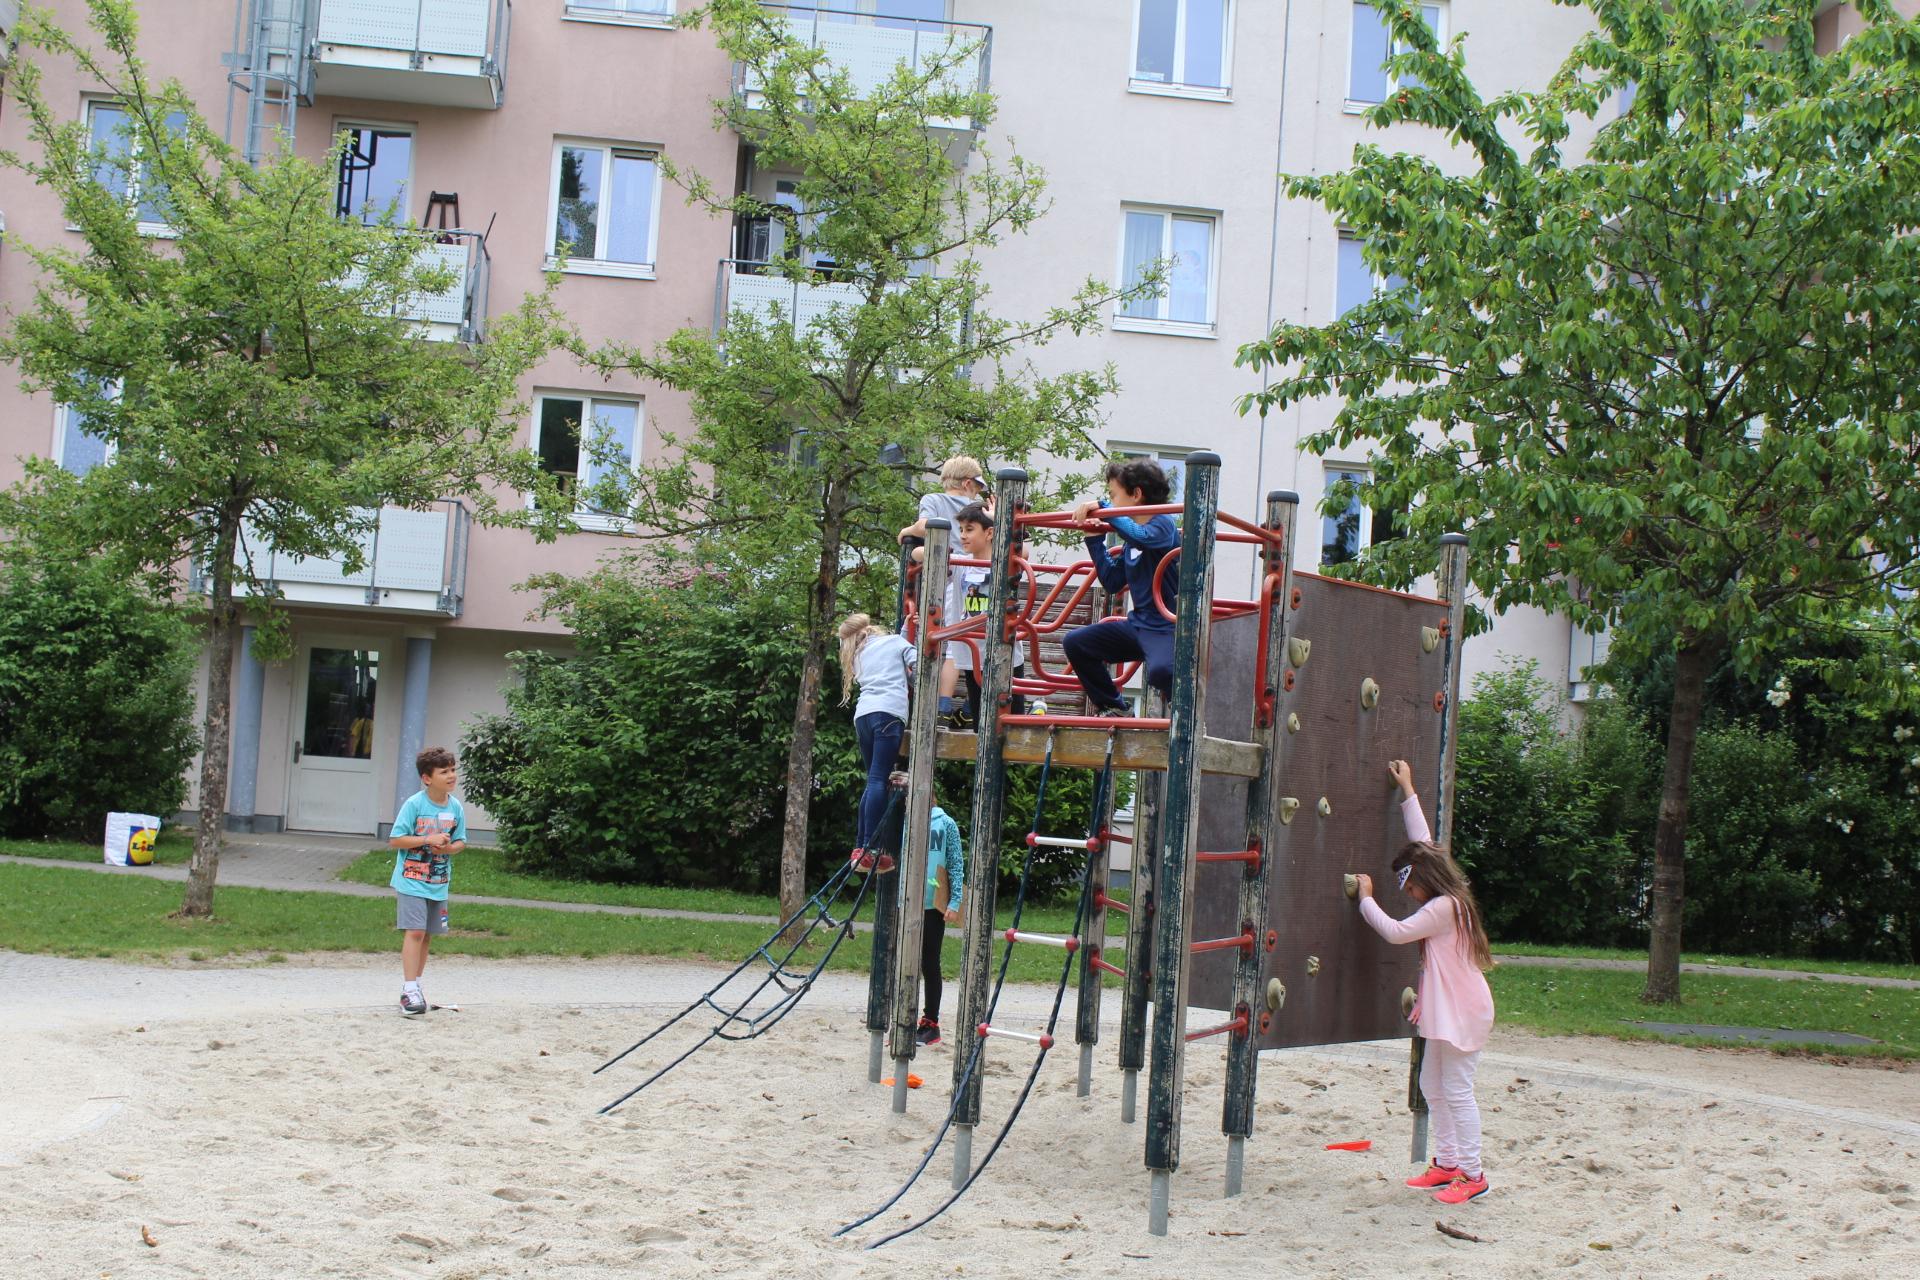 GS_Rotbuchenschule_SpielplatzSoyerhofstraße_11.06.15_LK.JPG